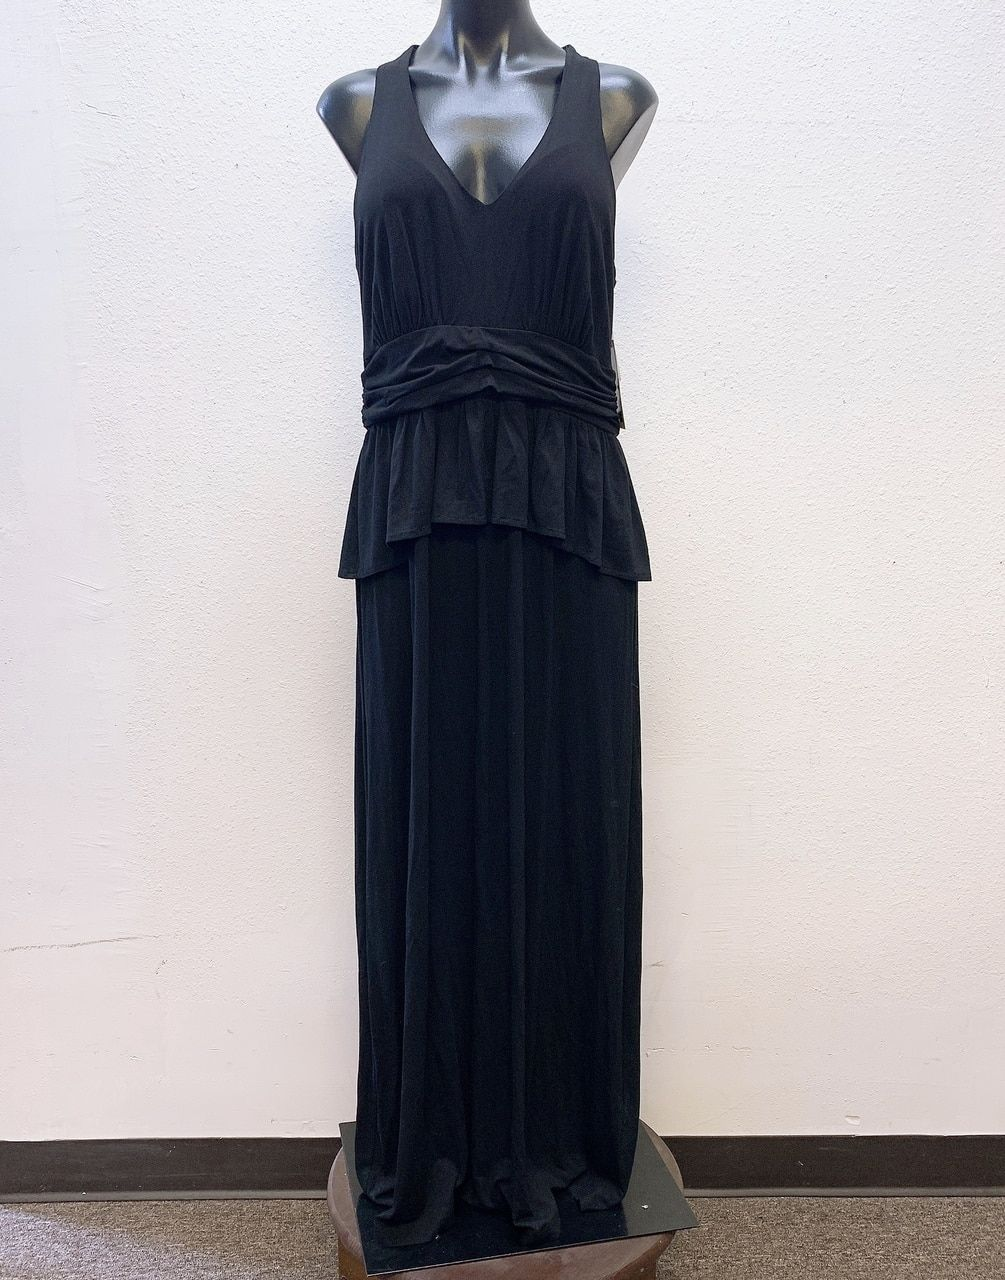 Nwt Julian Taylor Black Dress Maxi Size 12 For Just 24 79 Order At Shopthevogue Com Vintagevogue Neverpayretail Sh Black Maxi Dress Maxi Dress Black Dress [ 1280 x 1005 Pixel ]